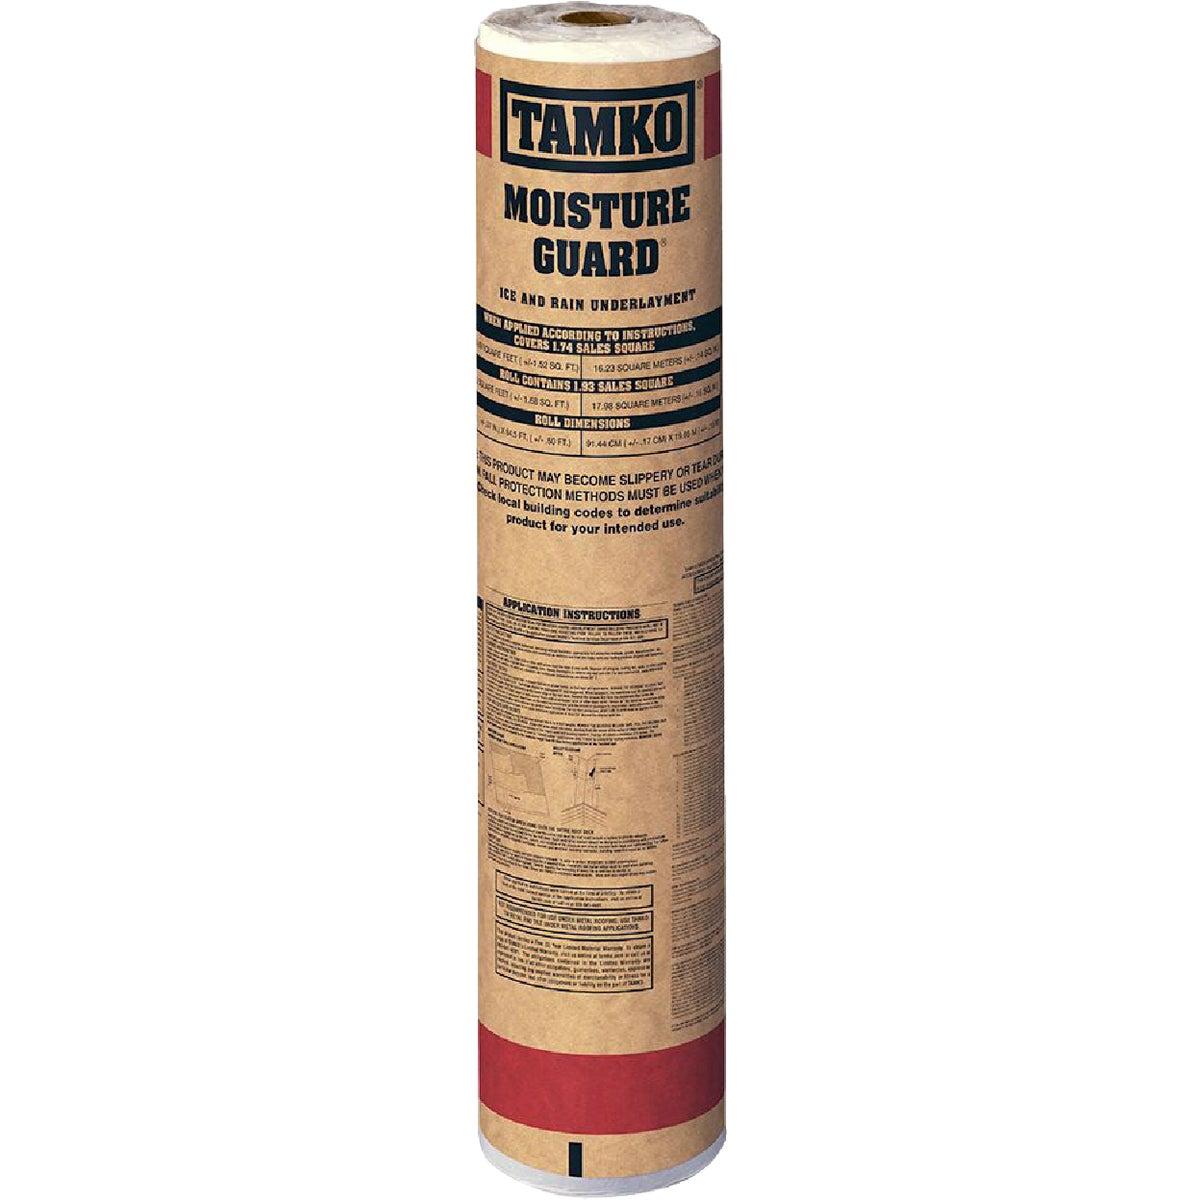 Tamko Build. Prod. Inc. MG PLUS MOISTURE GUARD 30000447